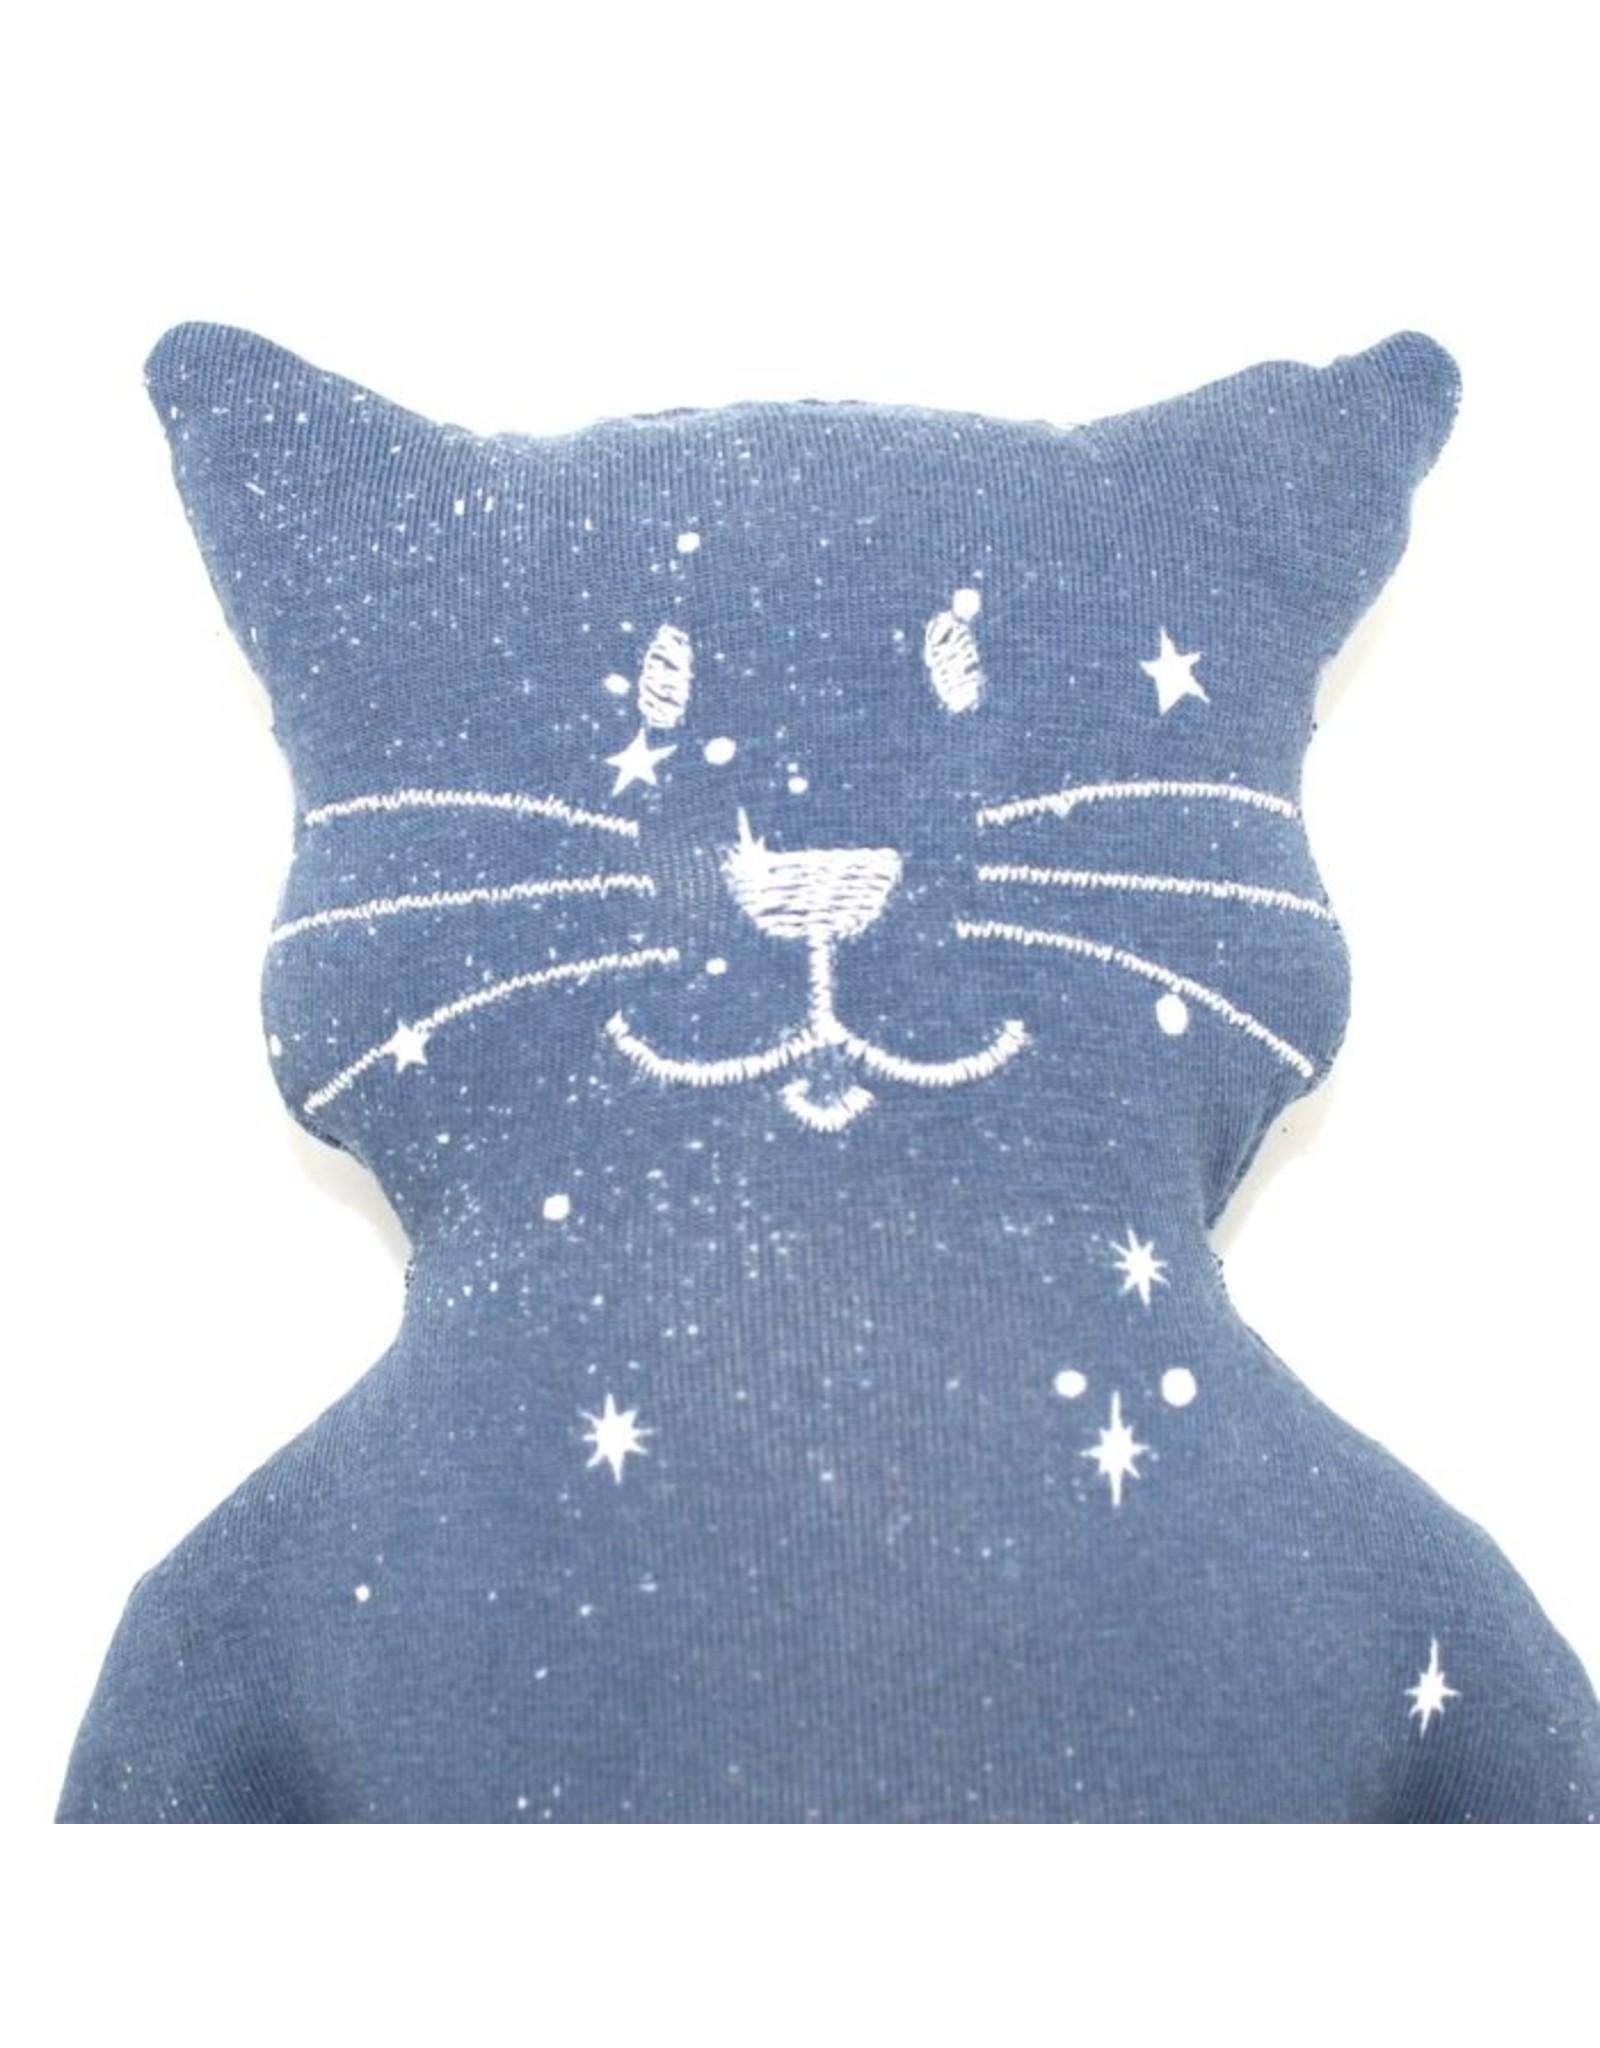 Katze Felis Sternenhimmel waschbar 95% Bio Baumwolle 5% Elasthan